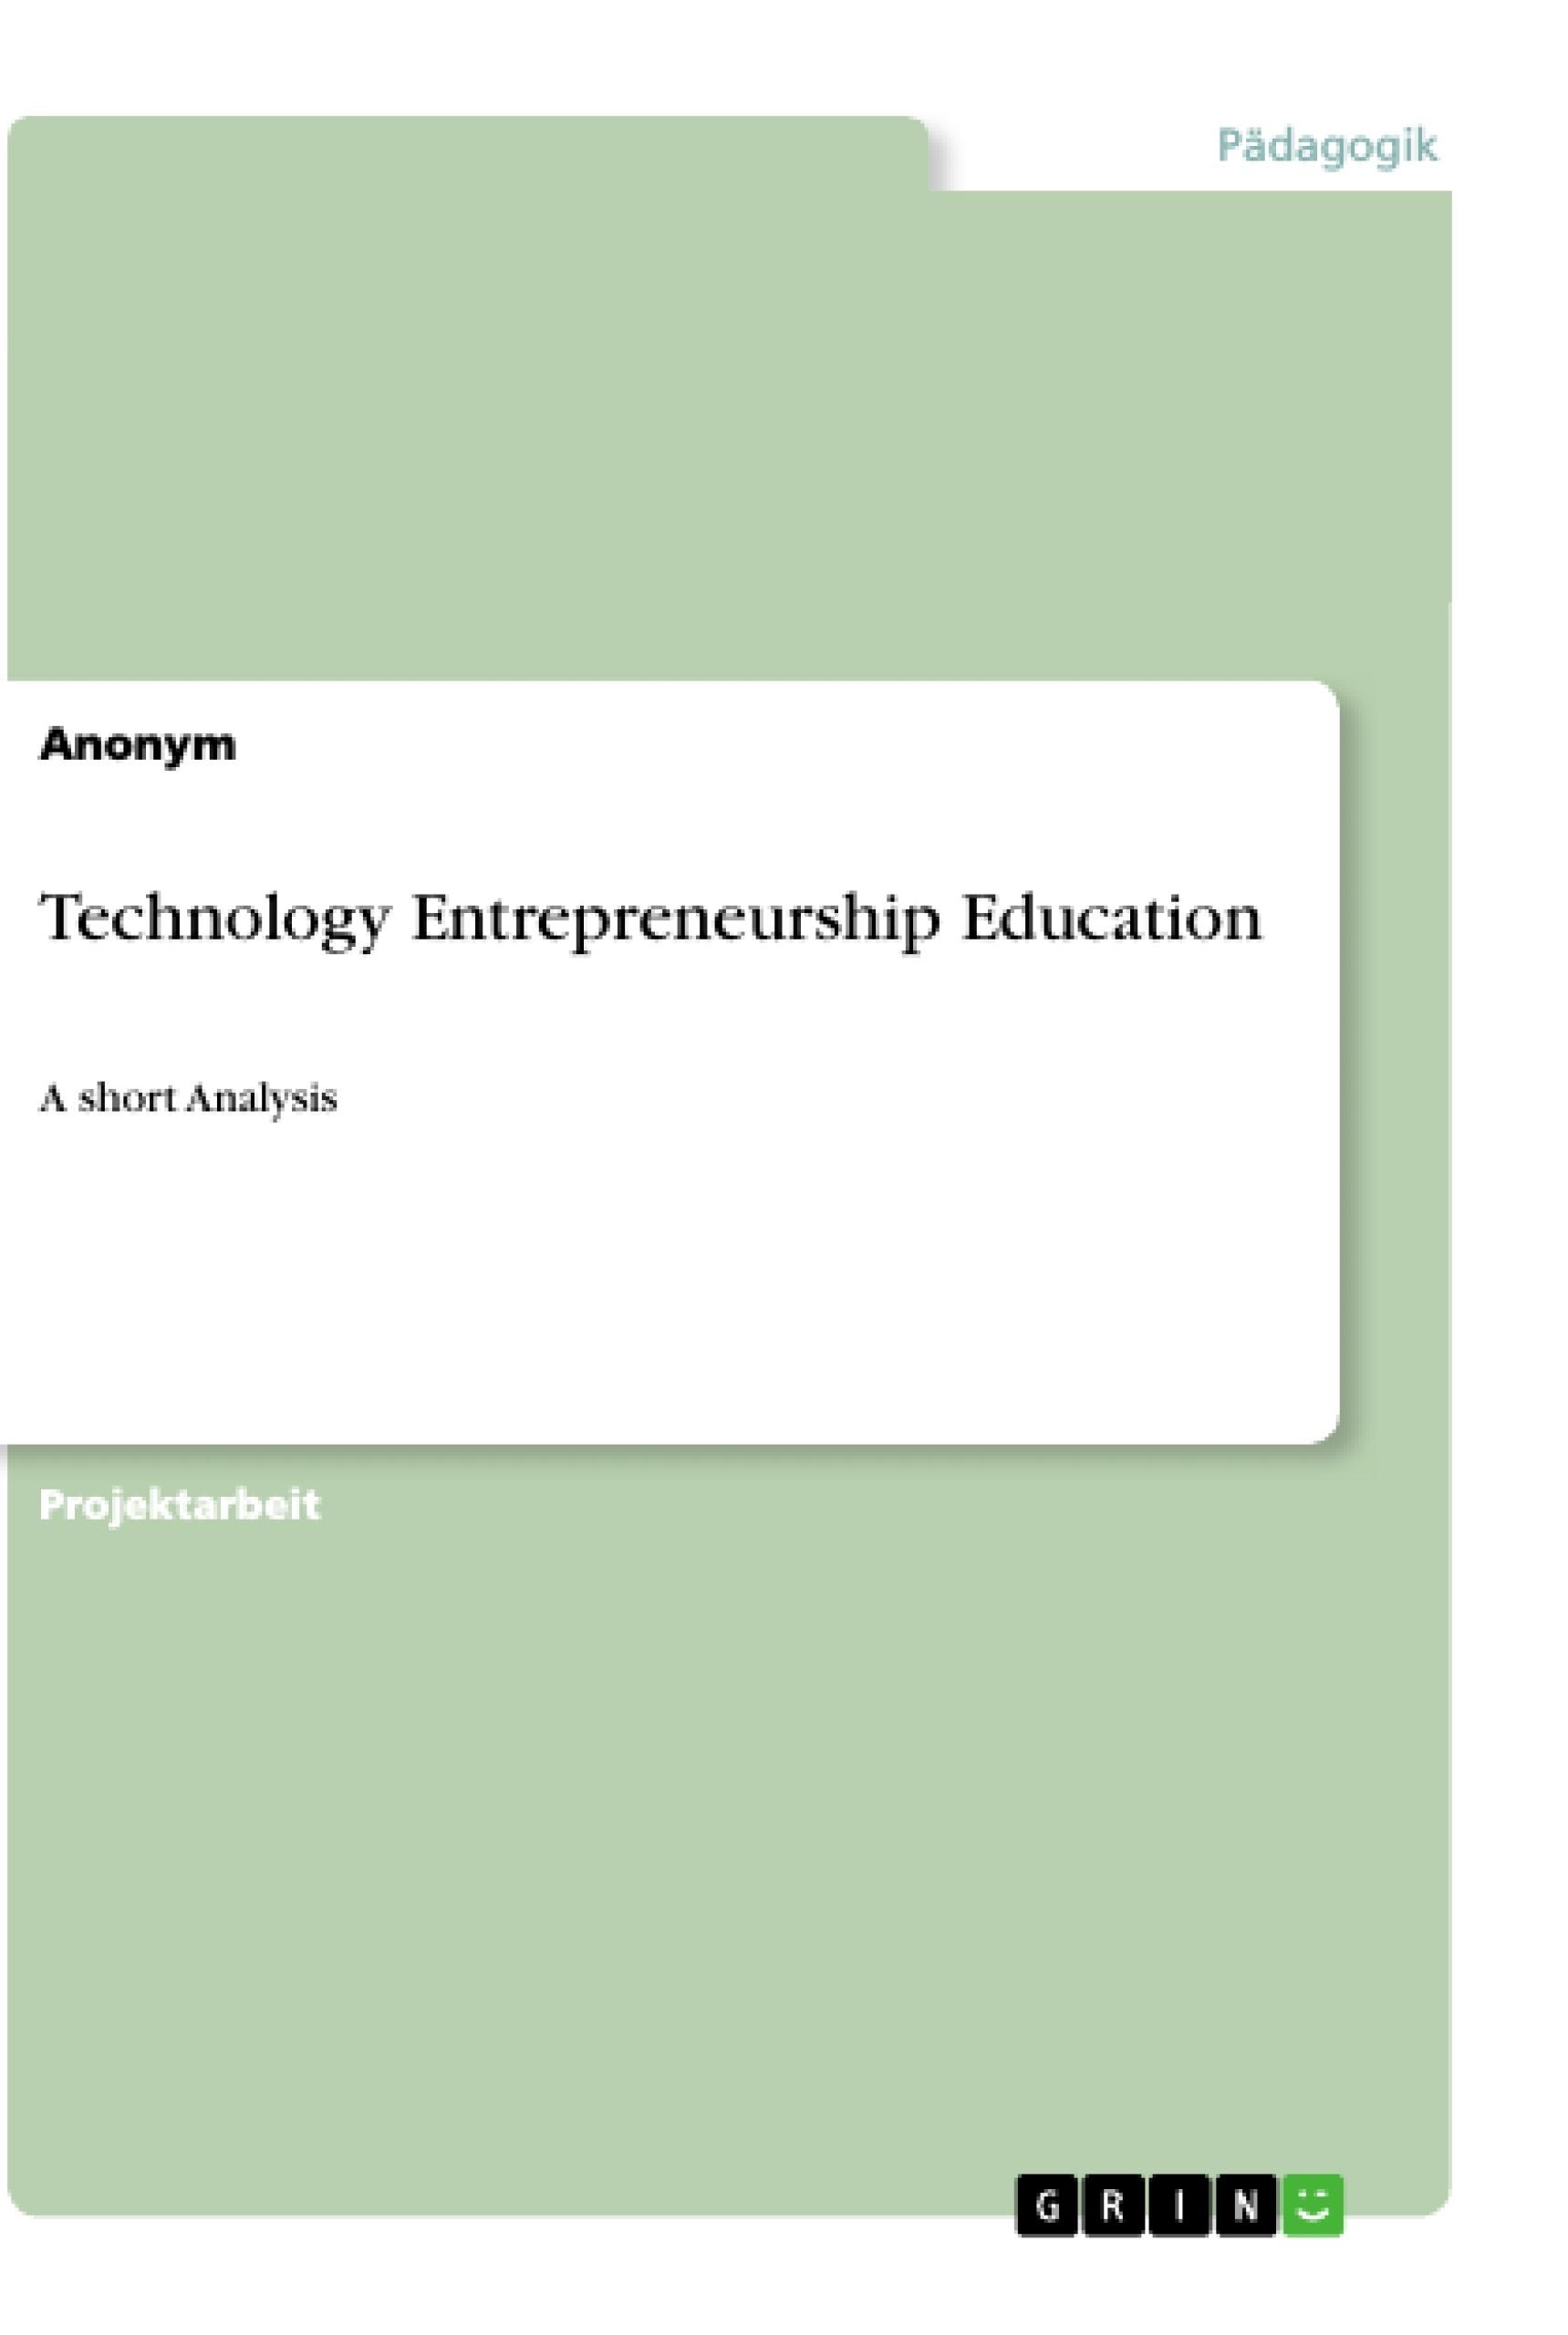 Titel: Technology Entrepreneurship Education